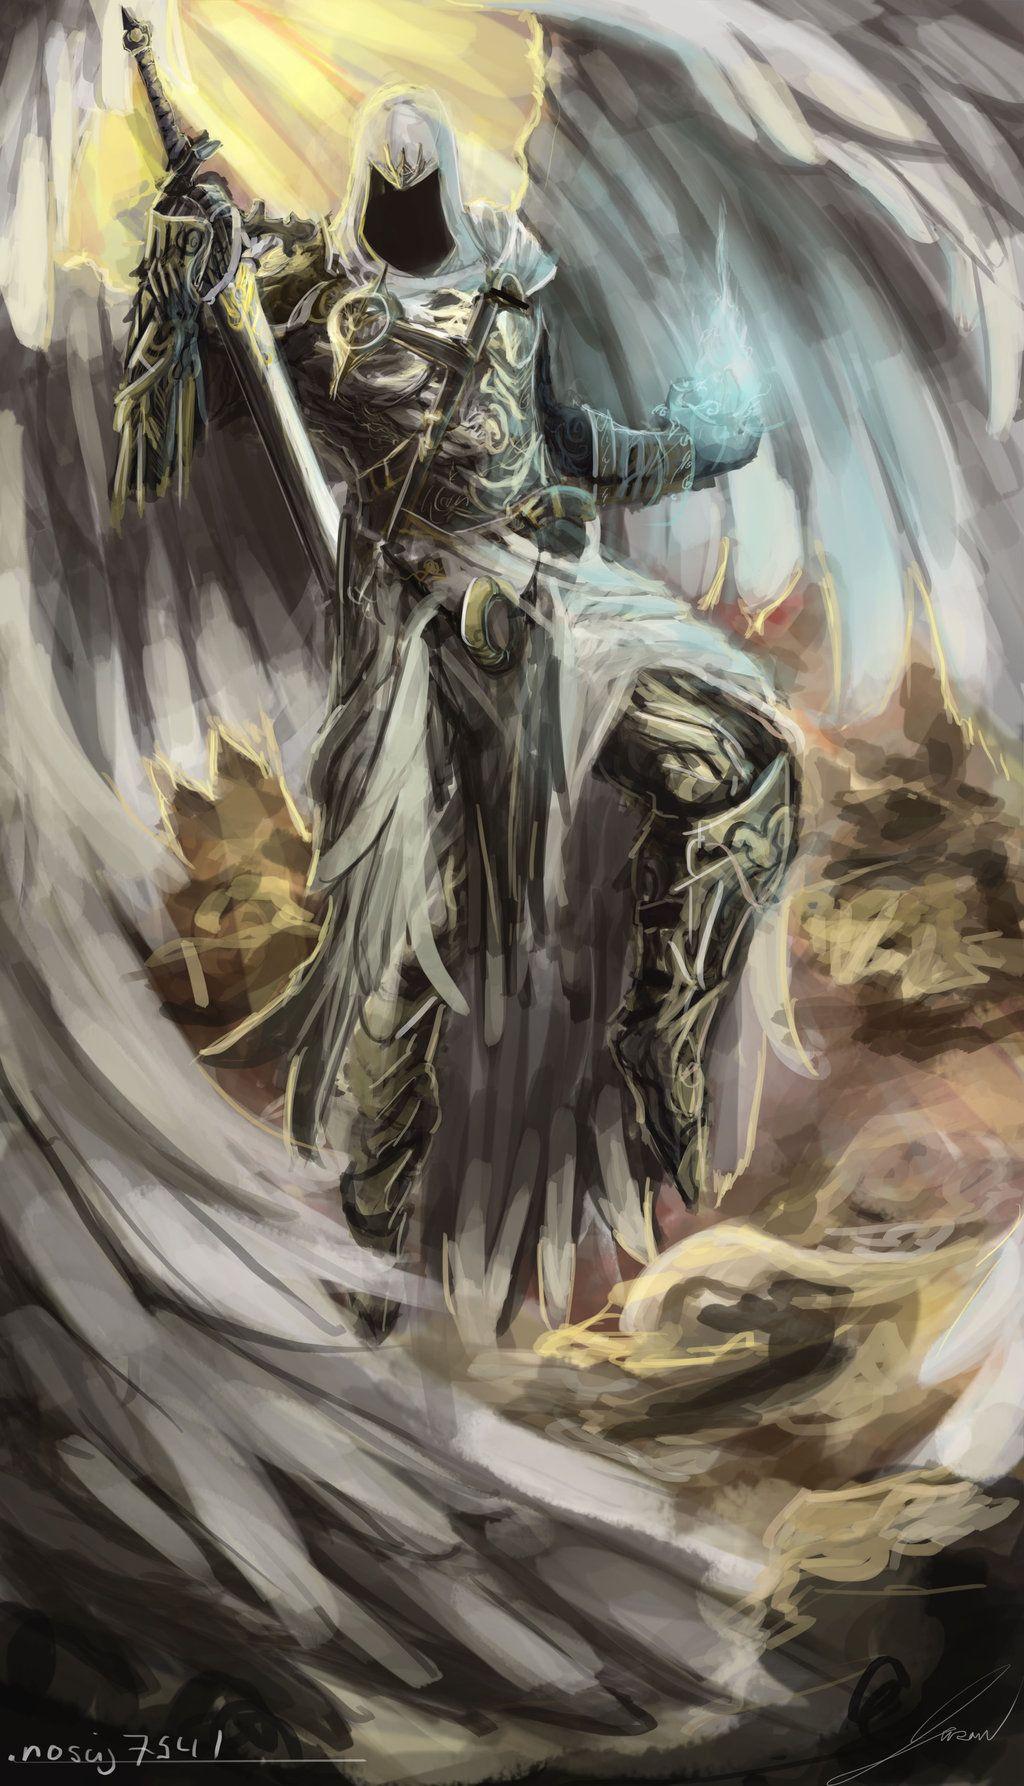 Arch Angel by *nosaj7541 on deviantART Assassin's Creed Angel version? ;)